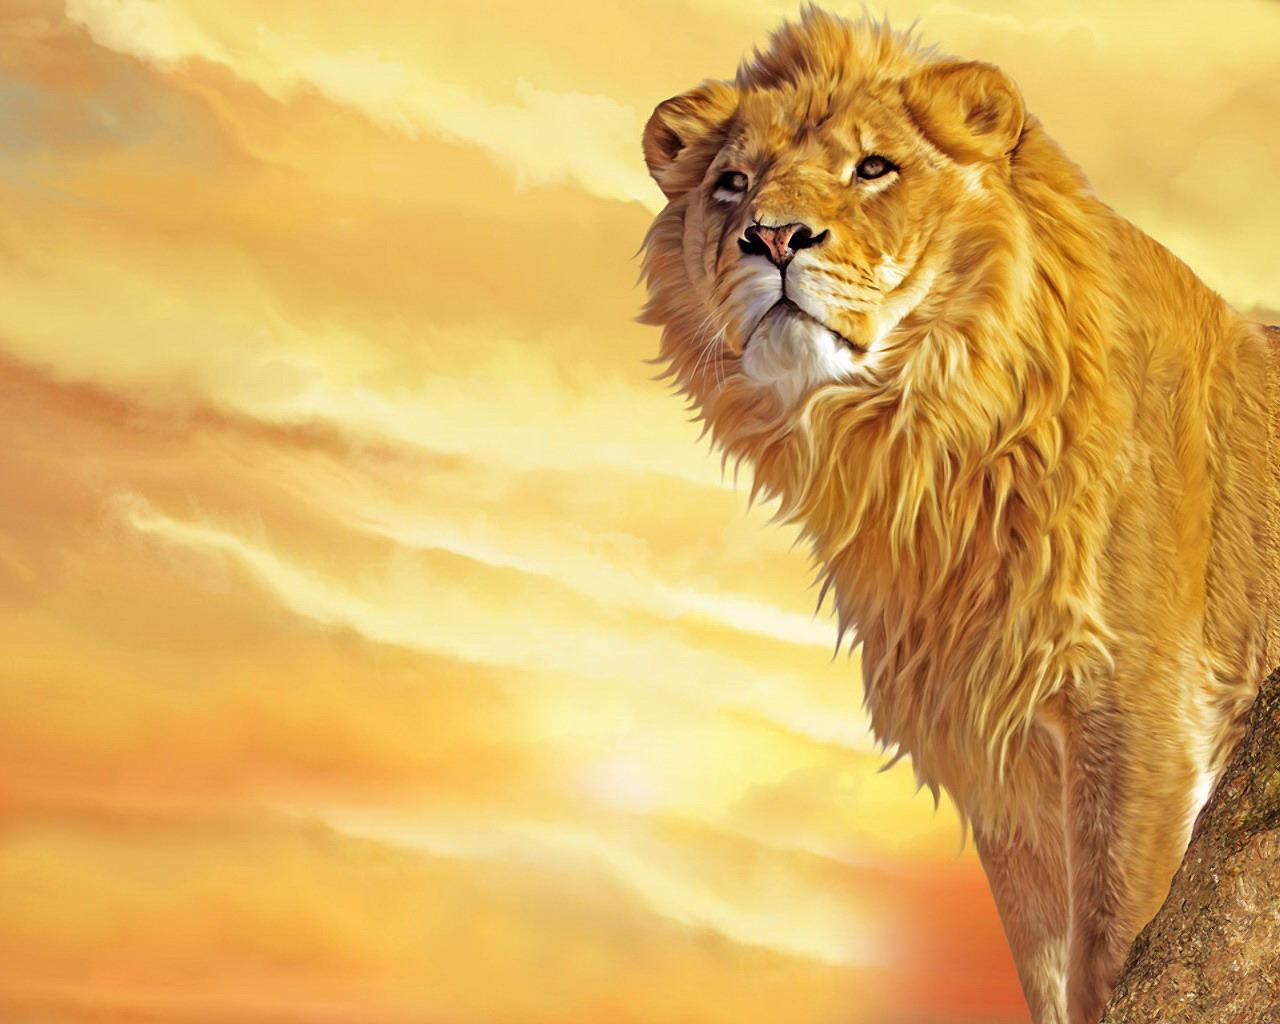 lion art young lion mara young lion lions lion growl wallpaper african 1280x1024